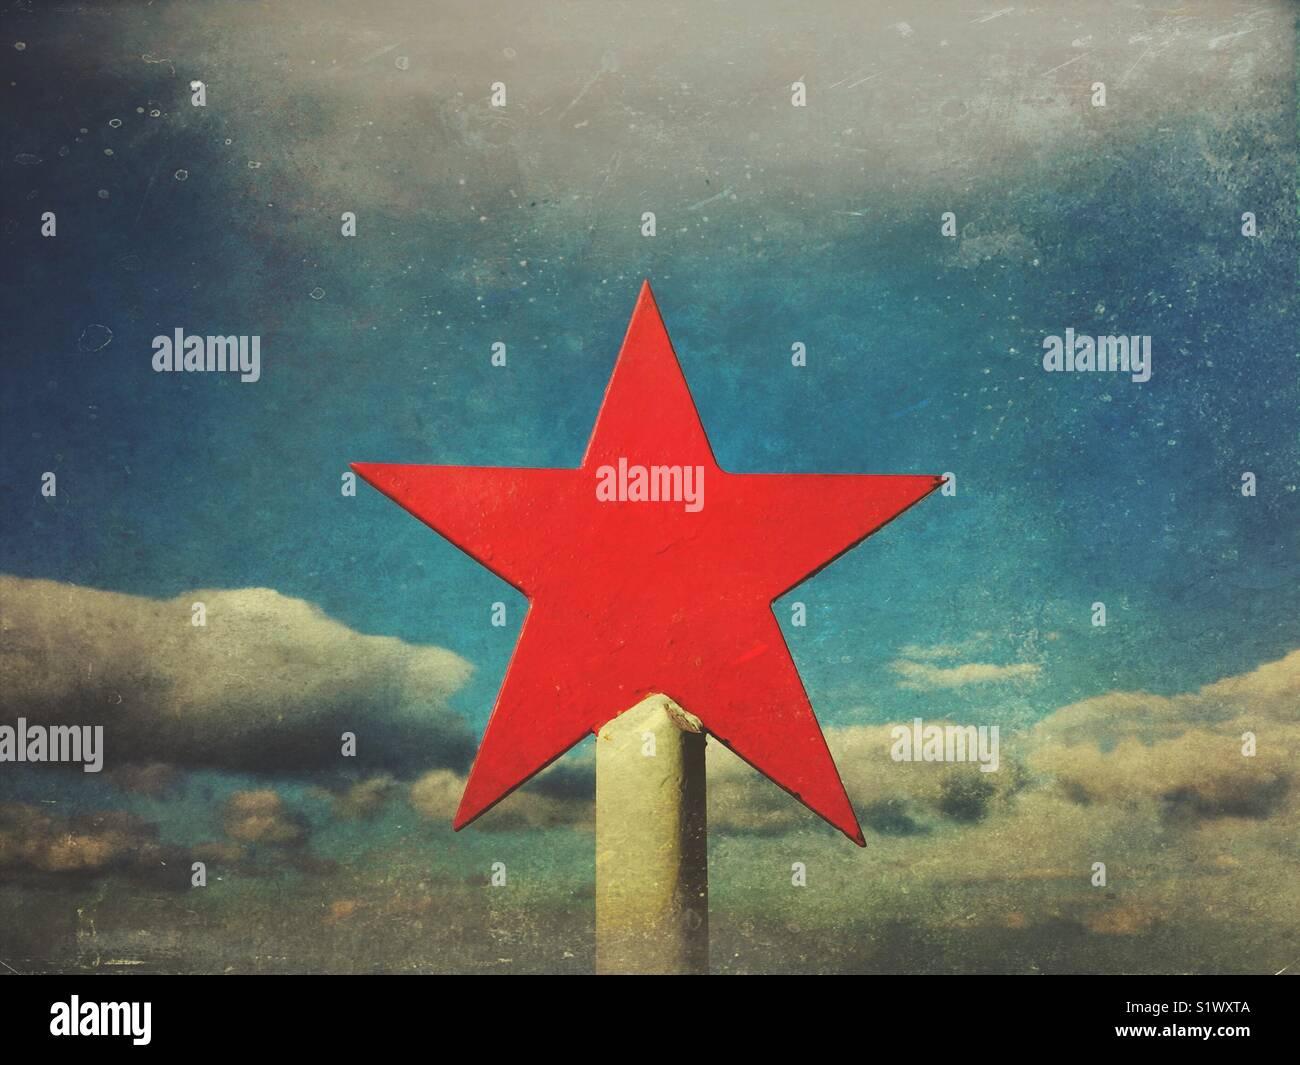 Fünfzackigen roten Stern gegen bewölkter Himmel Stockbild